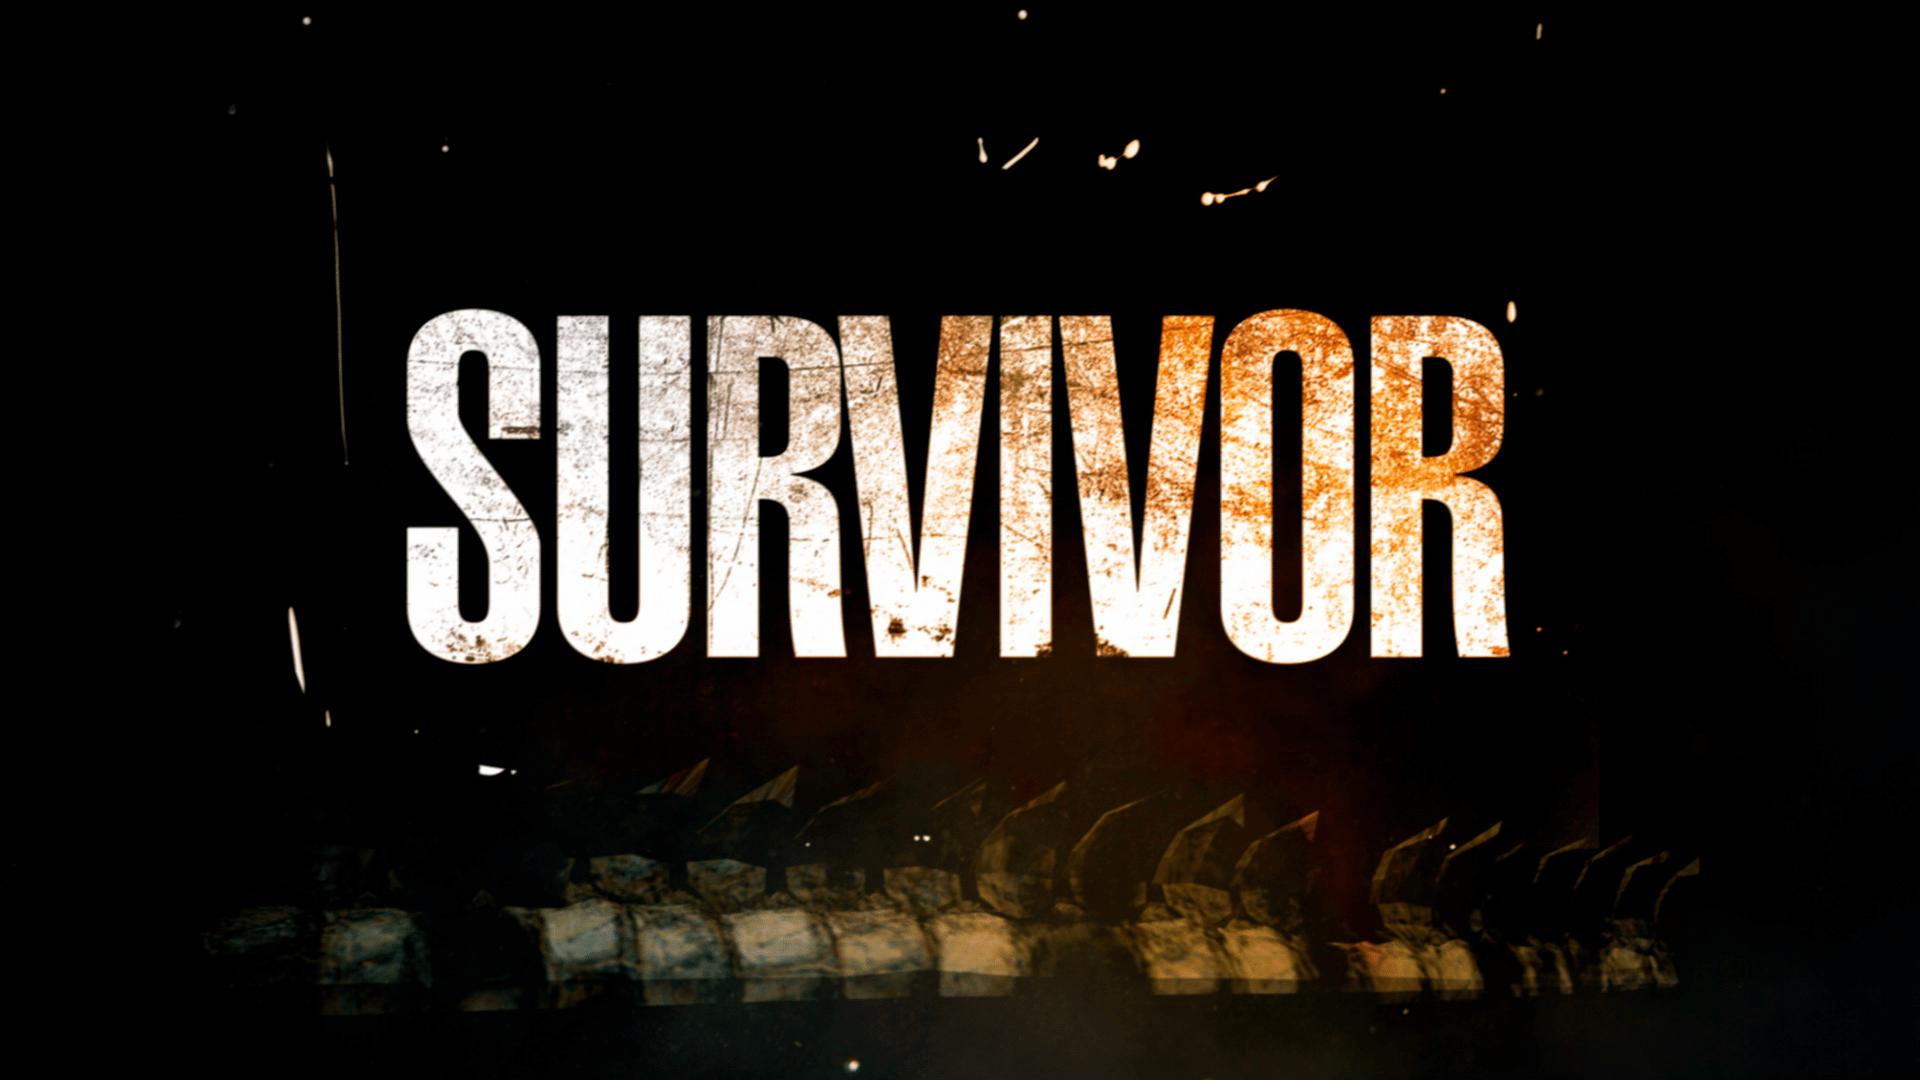 New 3d Animation Wallpaper Turbosquid Sighting Survivor Turbosquid Blog